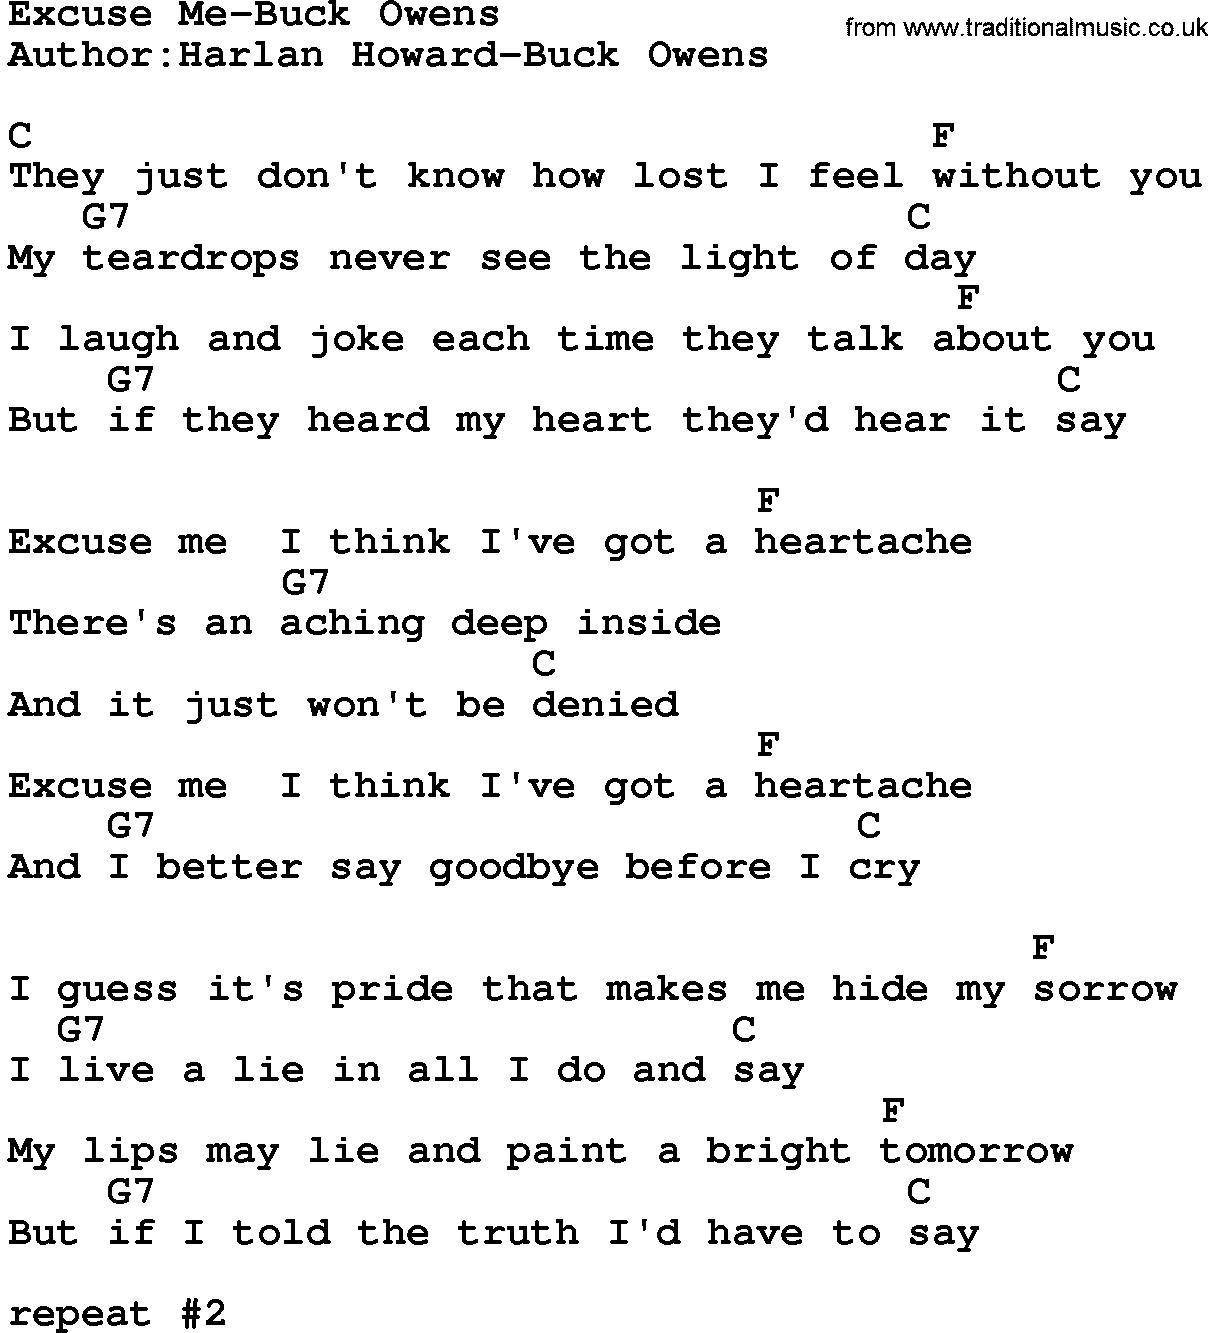 Buck owens song lyrics country music song excuse me buck owens country musicexcuse me buck owens lyrics and chords hexwebz Gallery